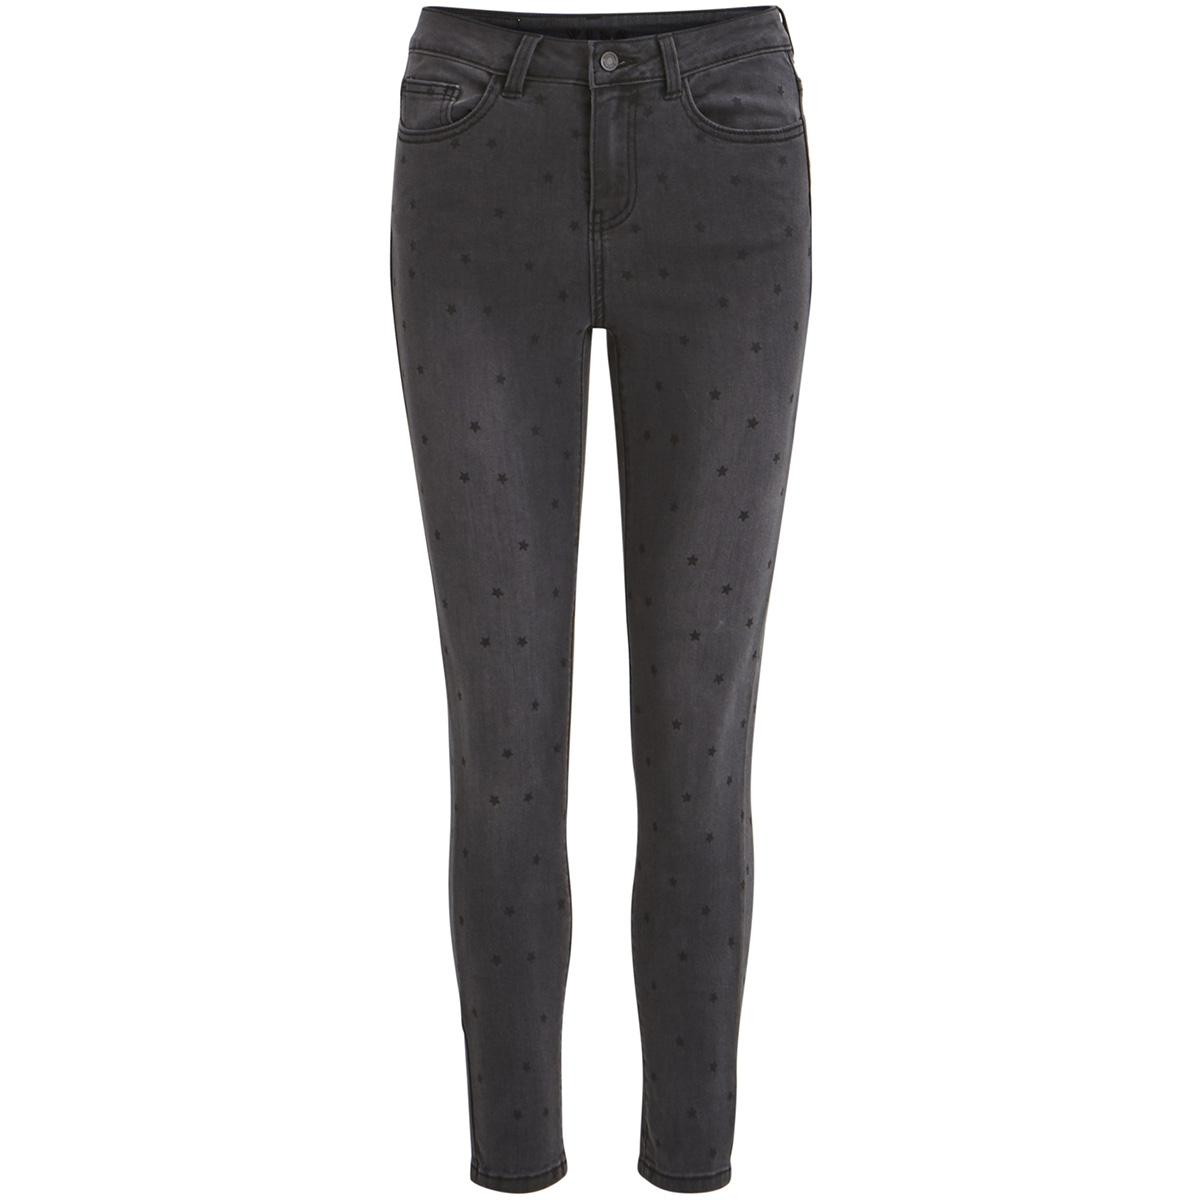 vicommit rw 7/8 star jeans 14051511 vila jeans black